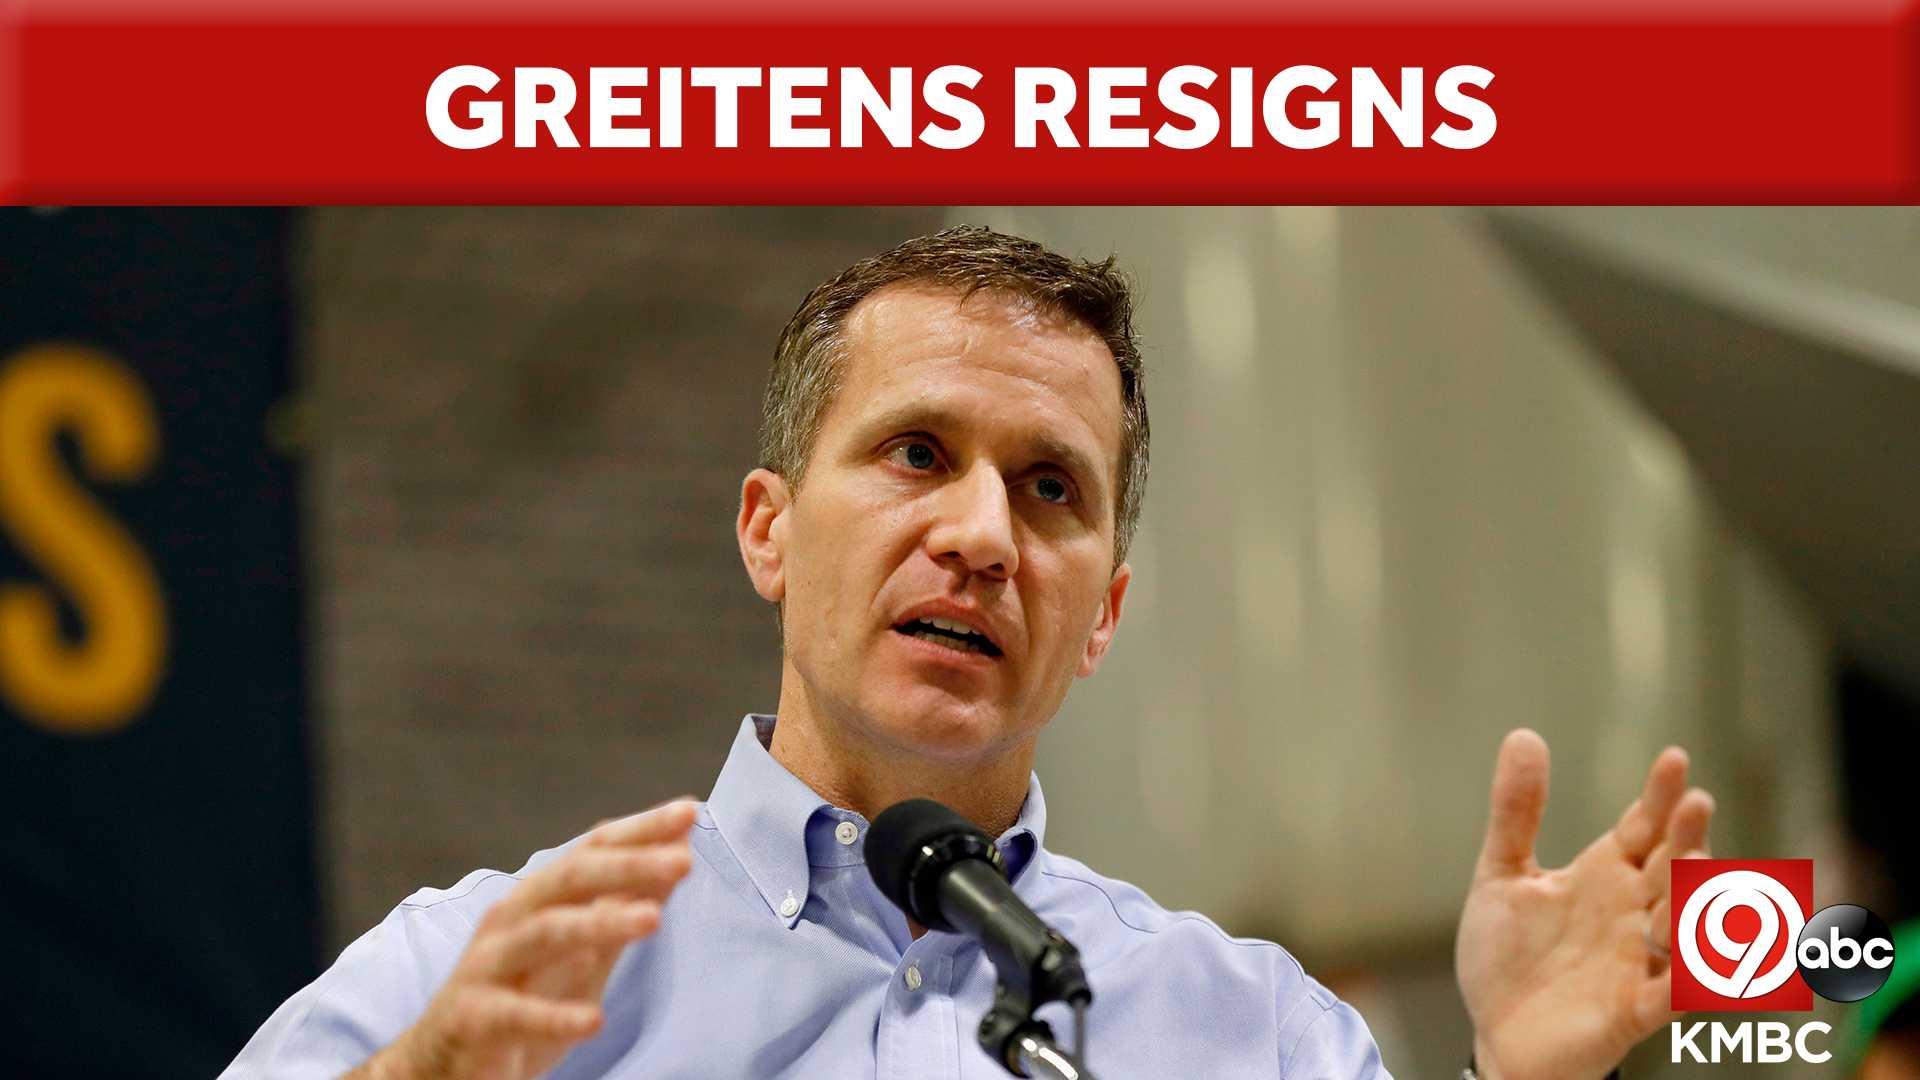 Greitens Resigns